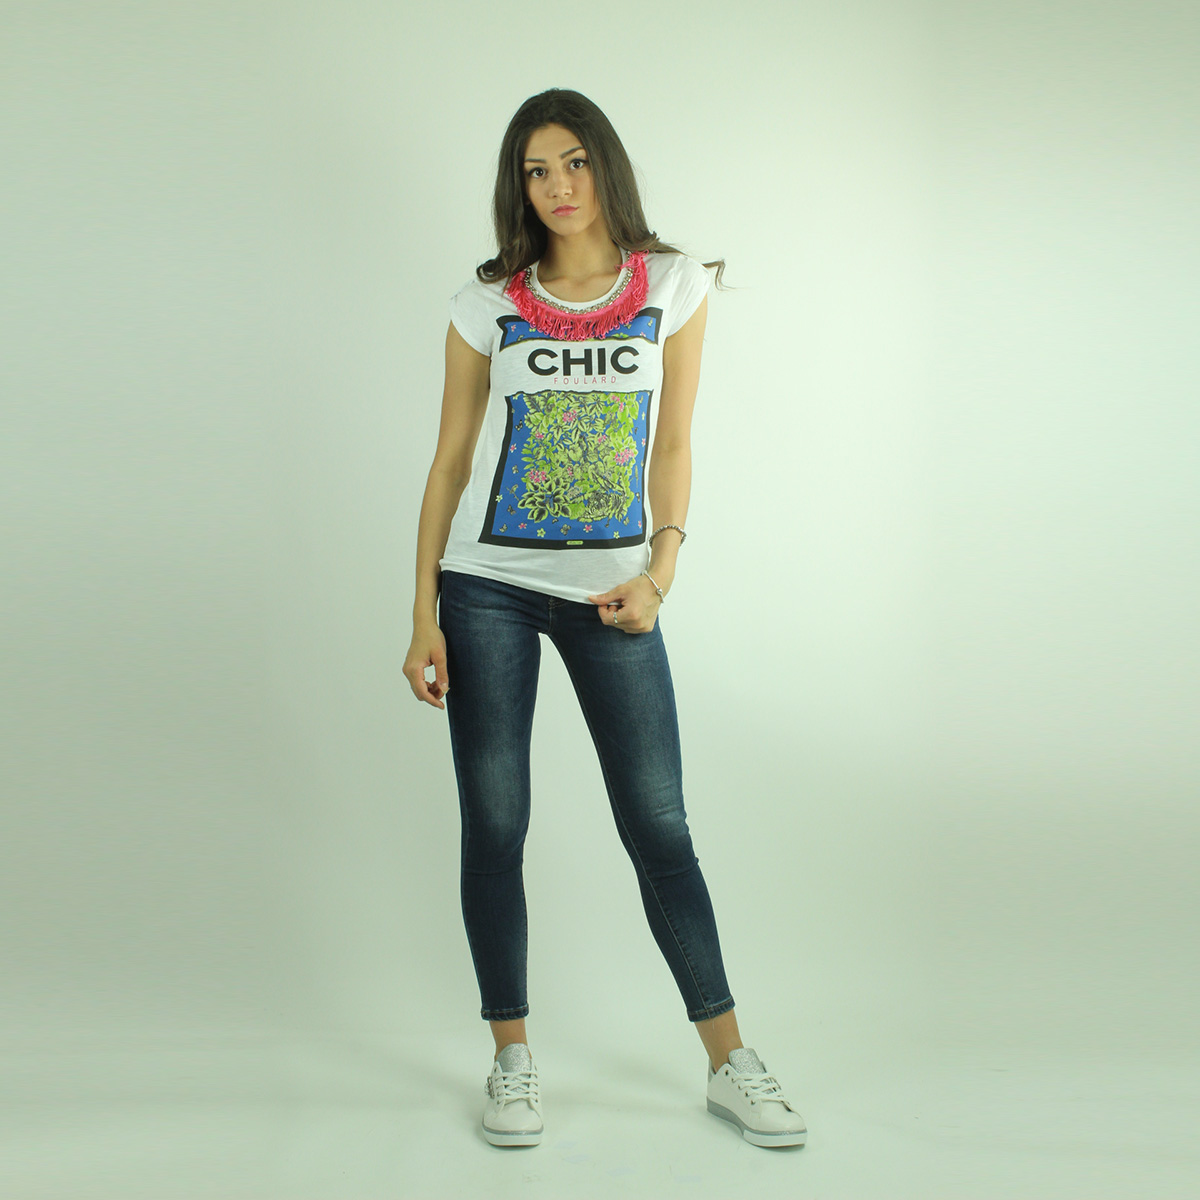 T-shirt donna assortite vari modelli e colori firmate LONDON INK 54f90f15973